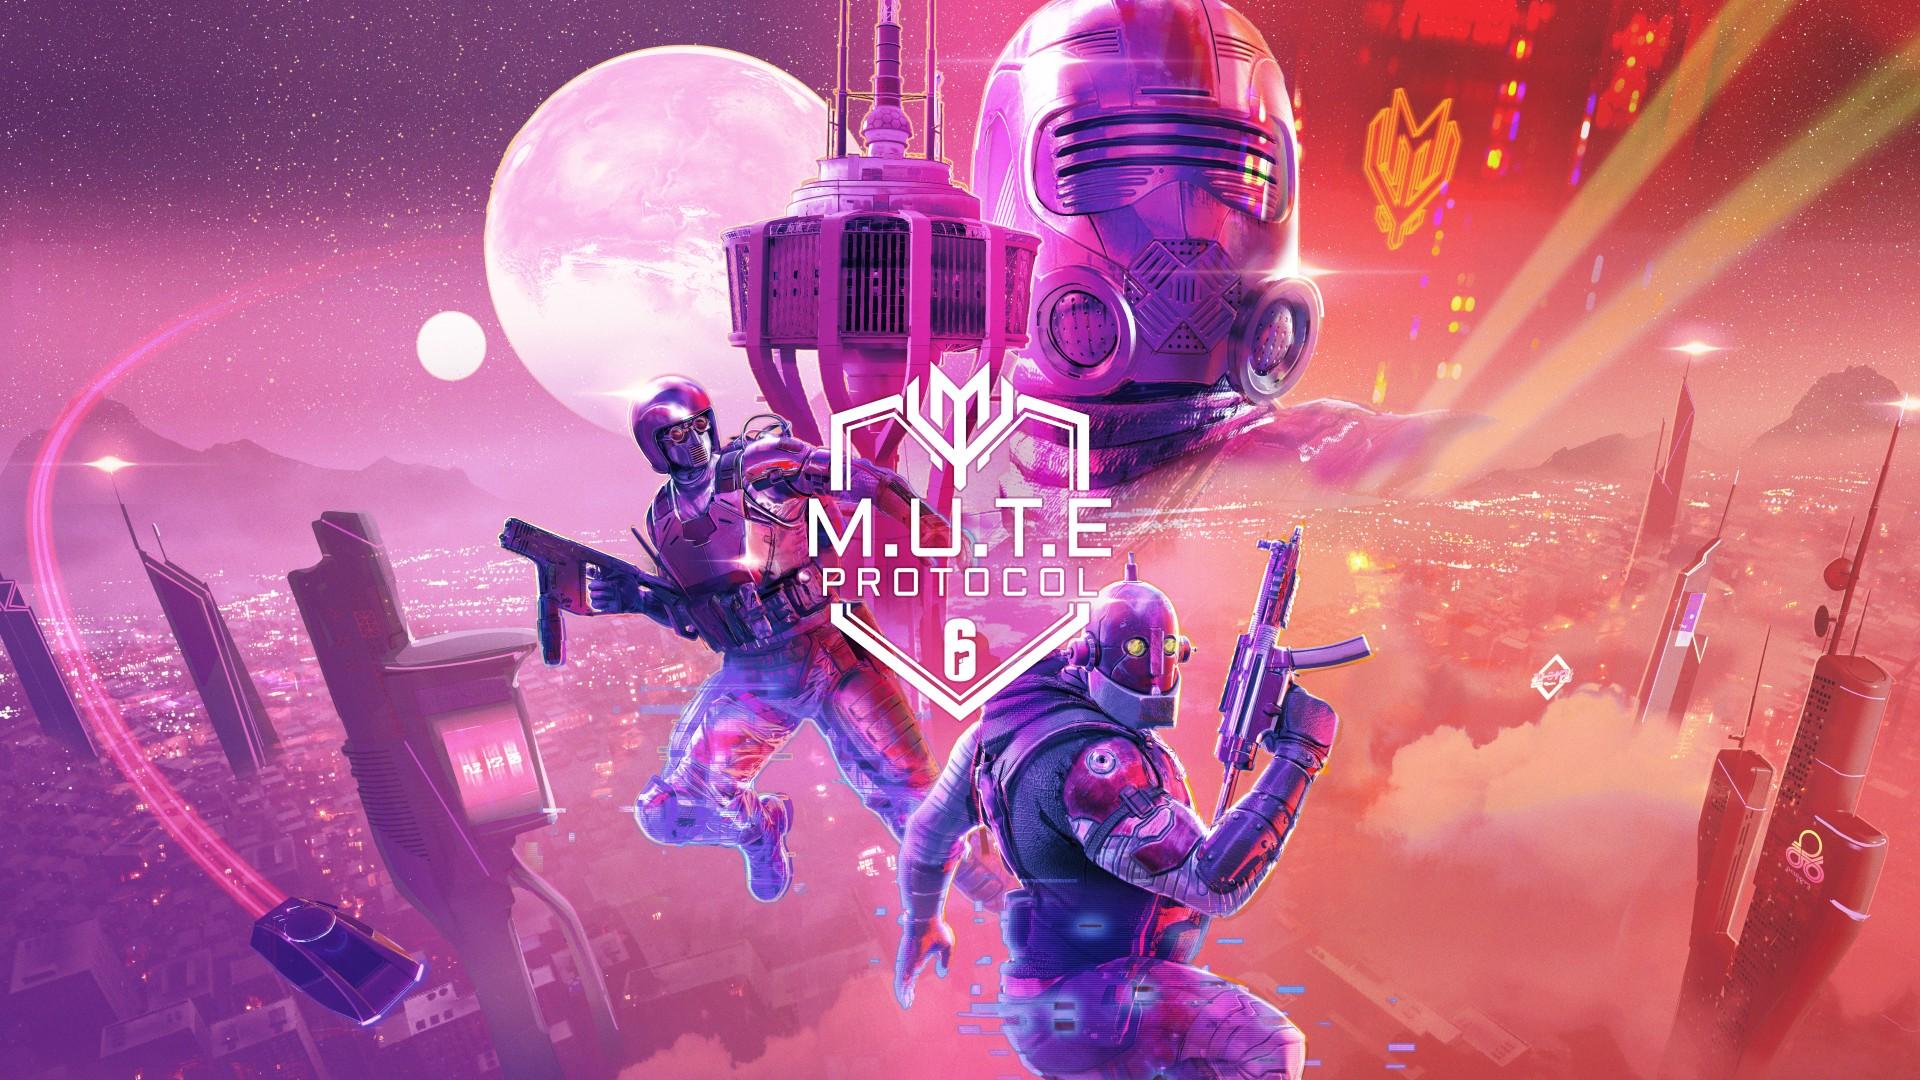 Tom Clancy's Rainbow Six Siege Announces Limited Time Event: M.U.T.E. PROTOCOL